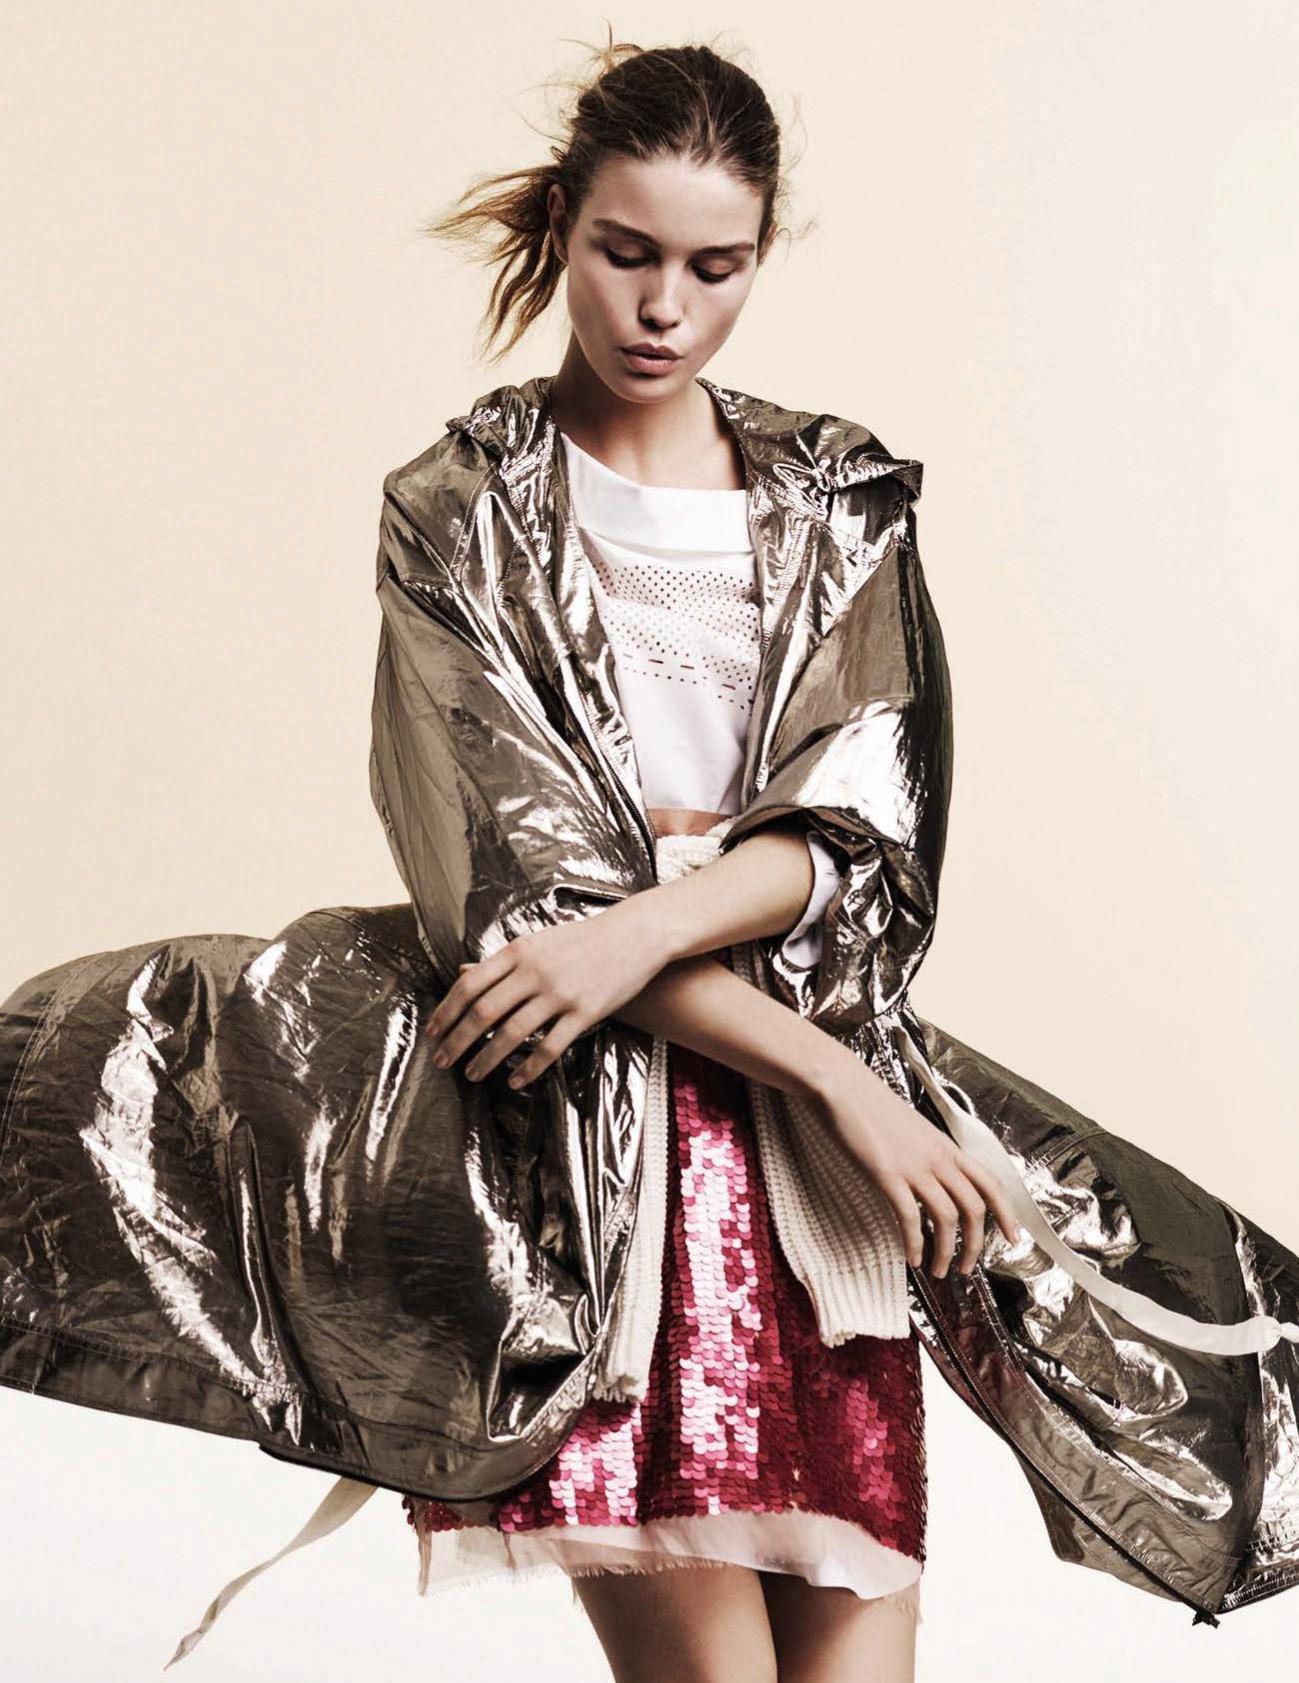 Essential Winter Coats Every Girl Should Own - Windbreaker Jacket // NotJessFashion.com